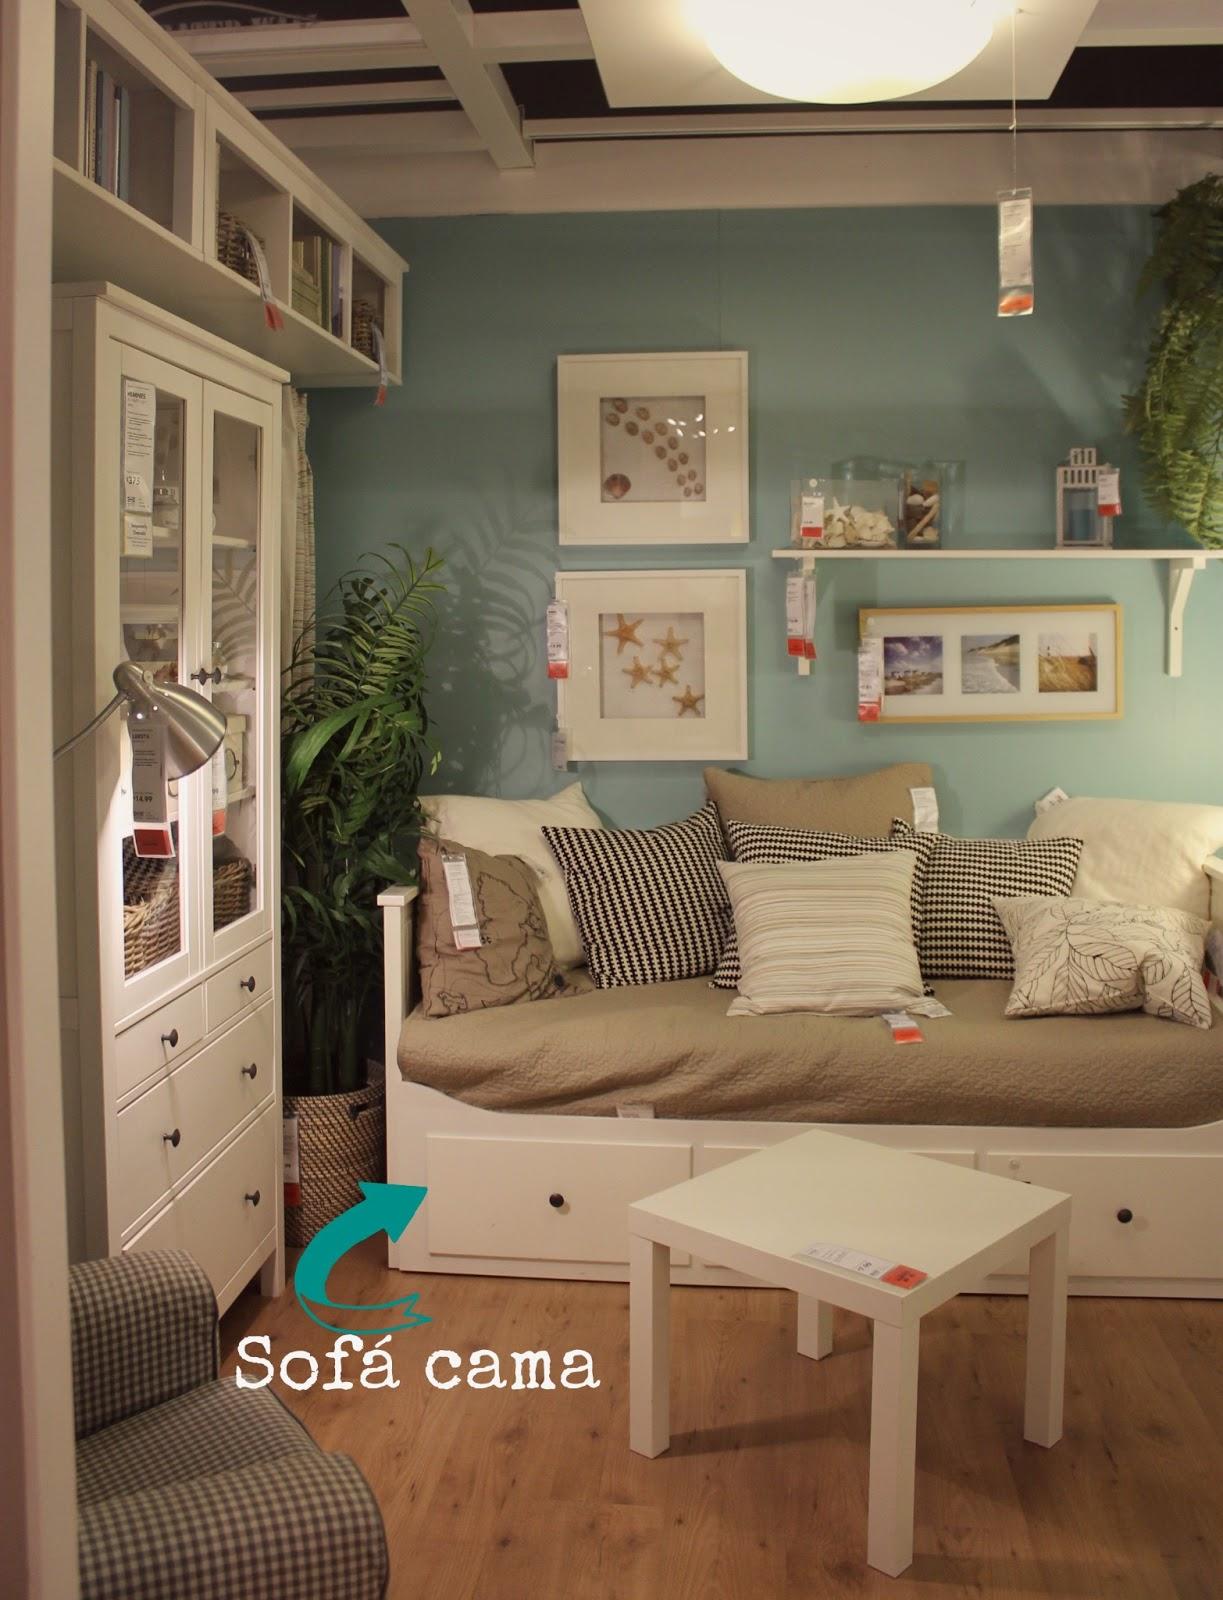 Casa montada pouco espa o e boas solu es for Sofa que vira beliche